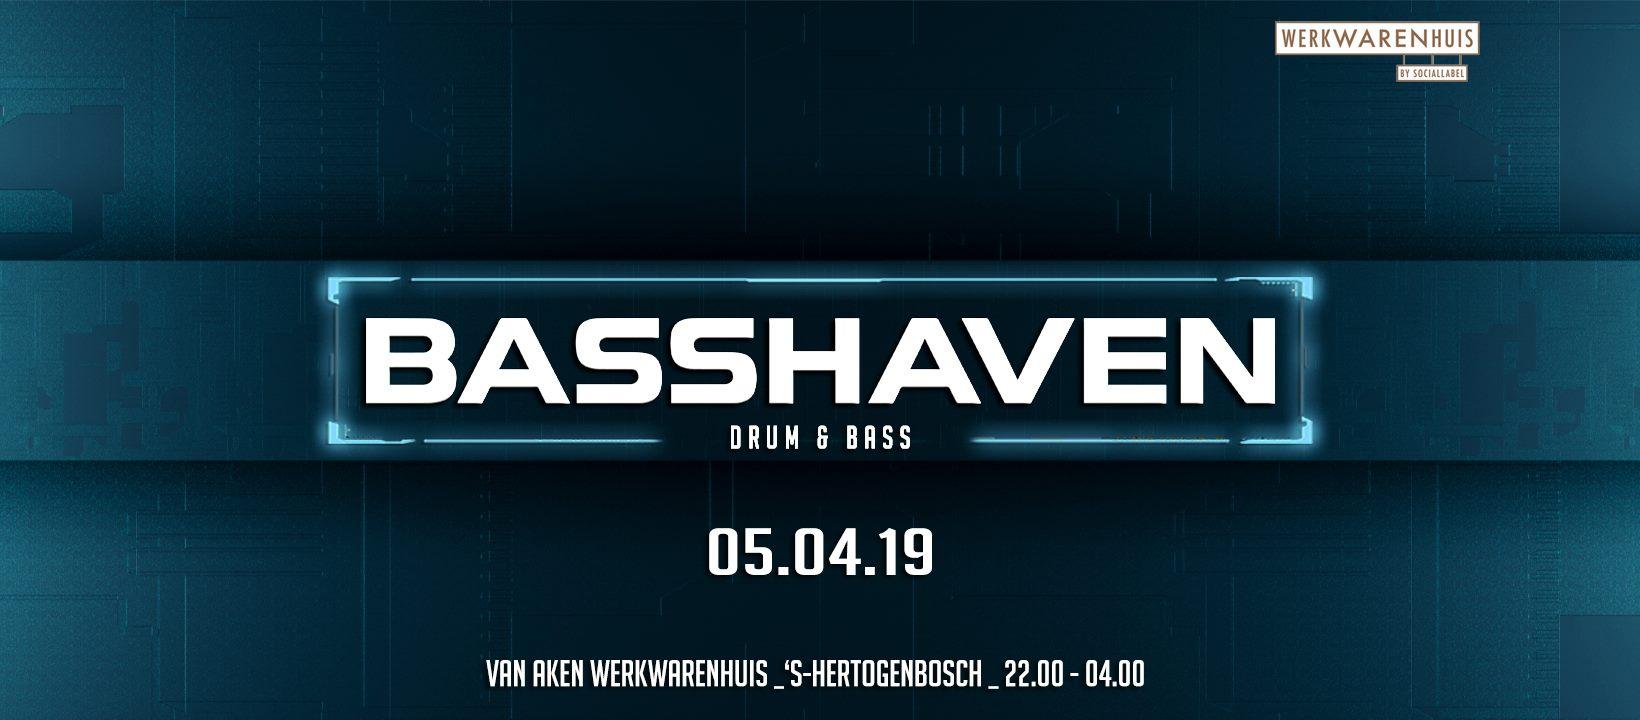 Basshaven #07 ►Dossa & Locuzzed & more TBA!